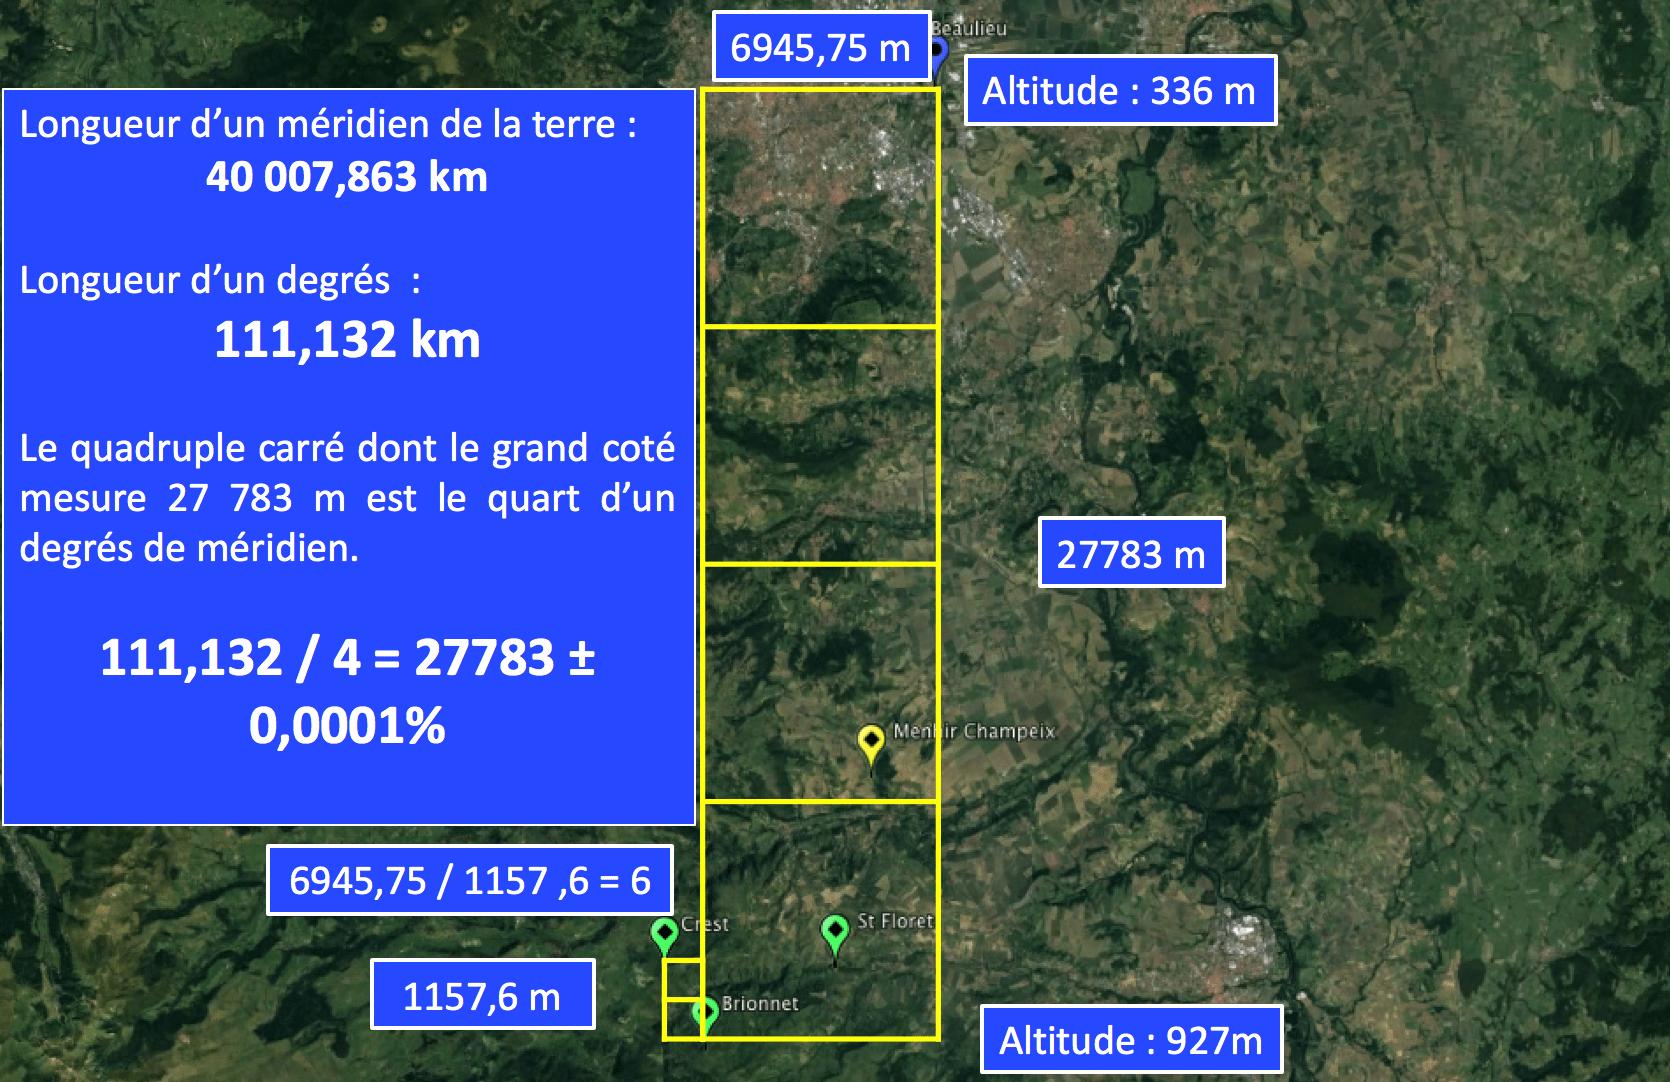 2017-06-08 21:37:04